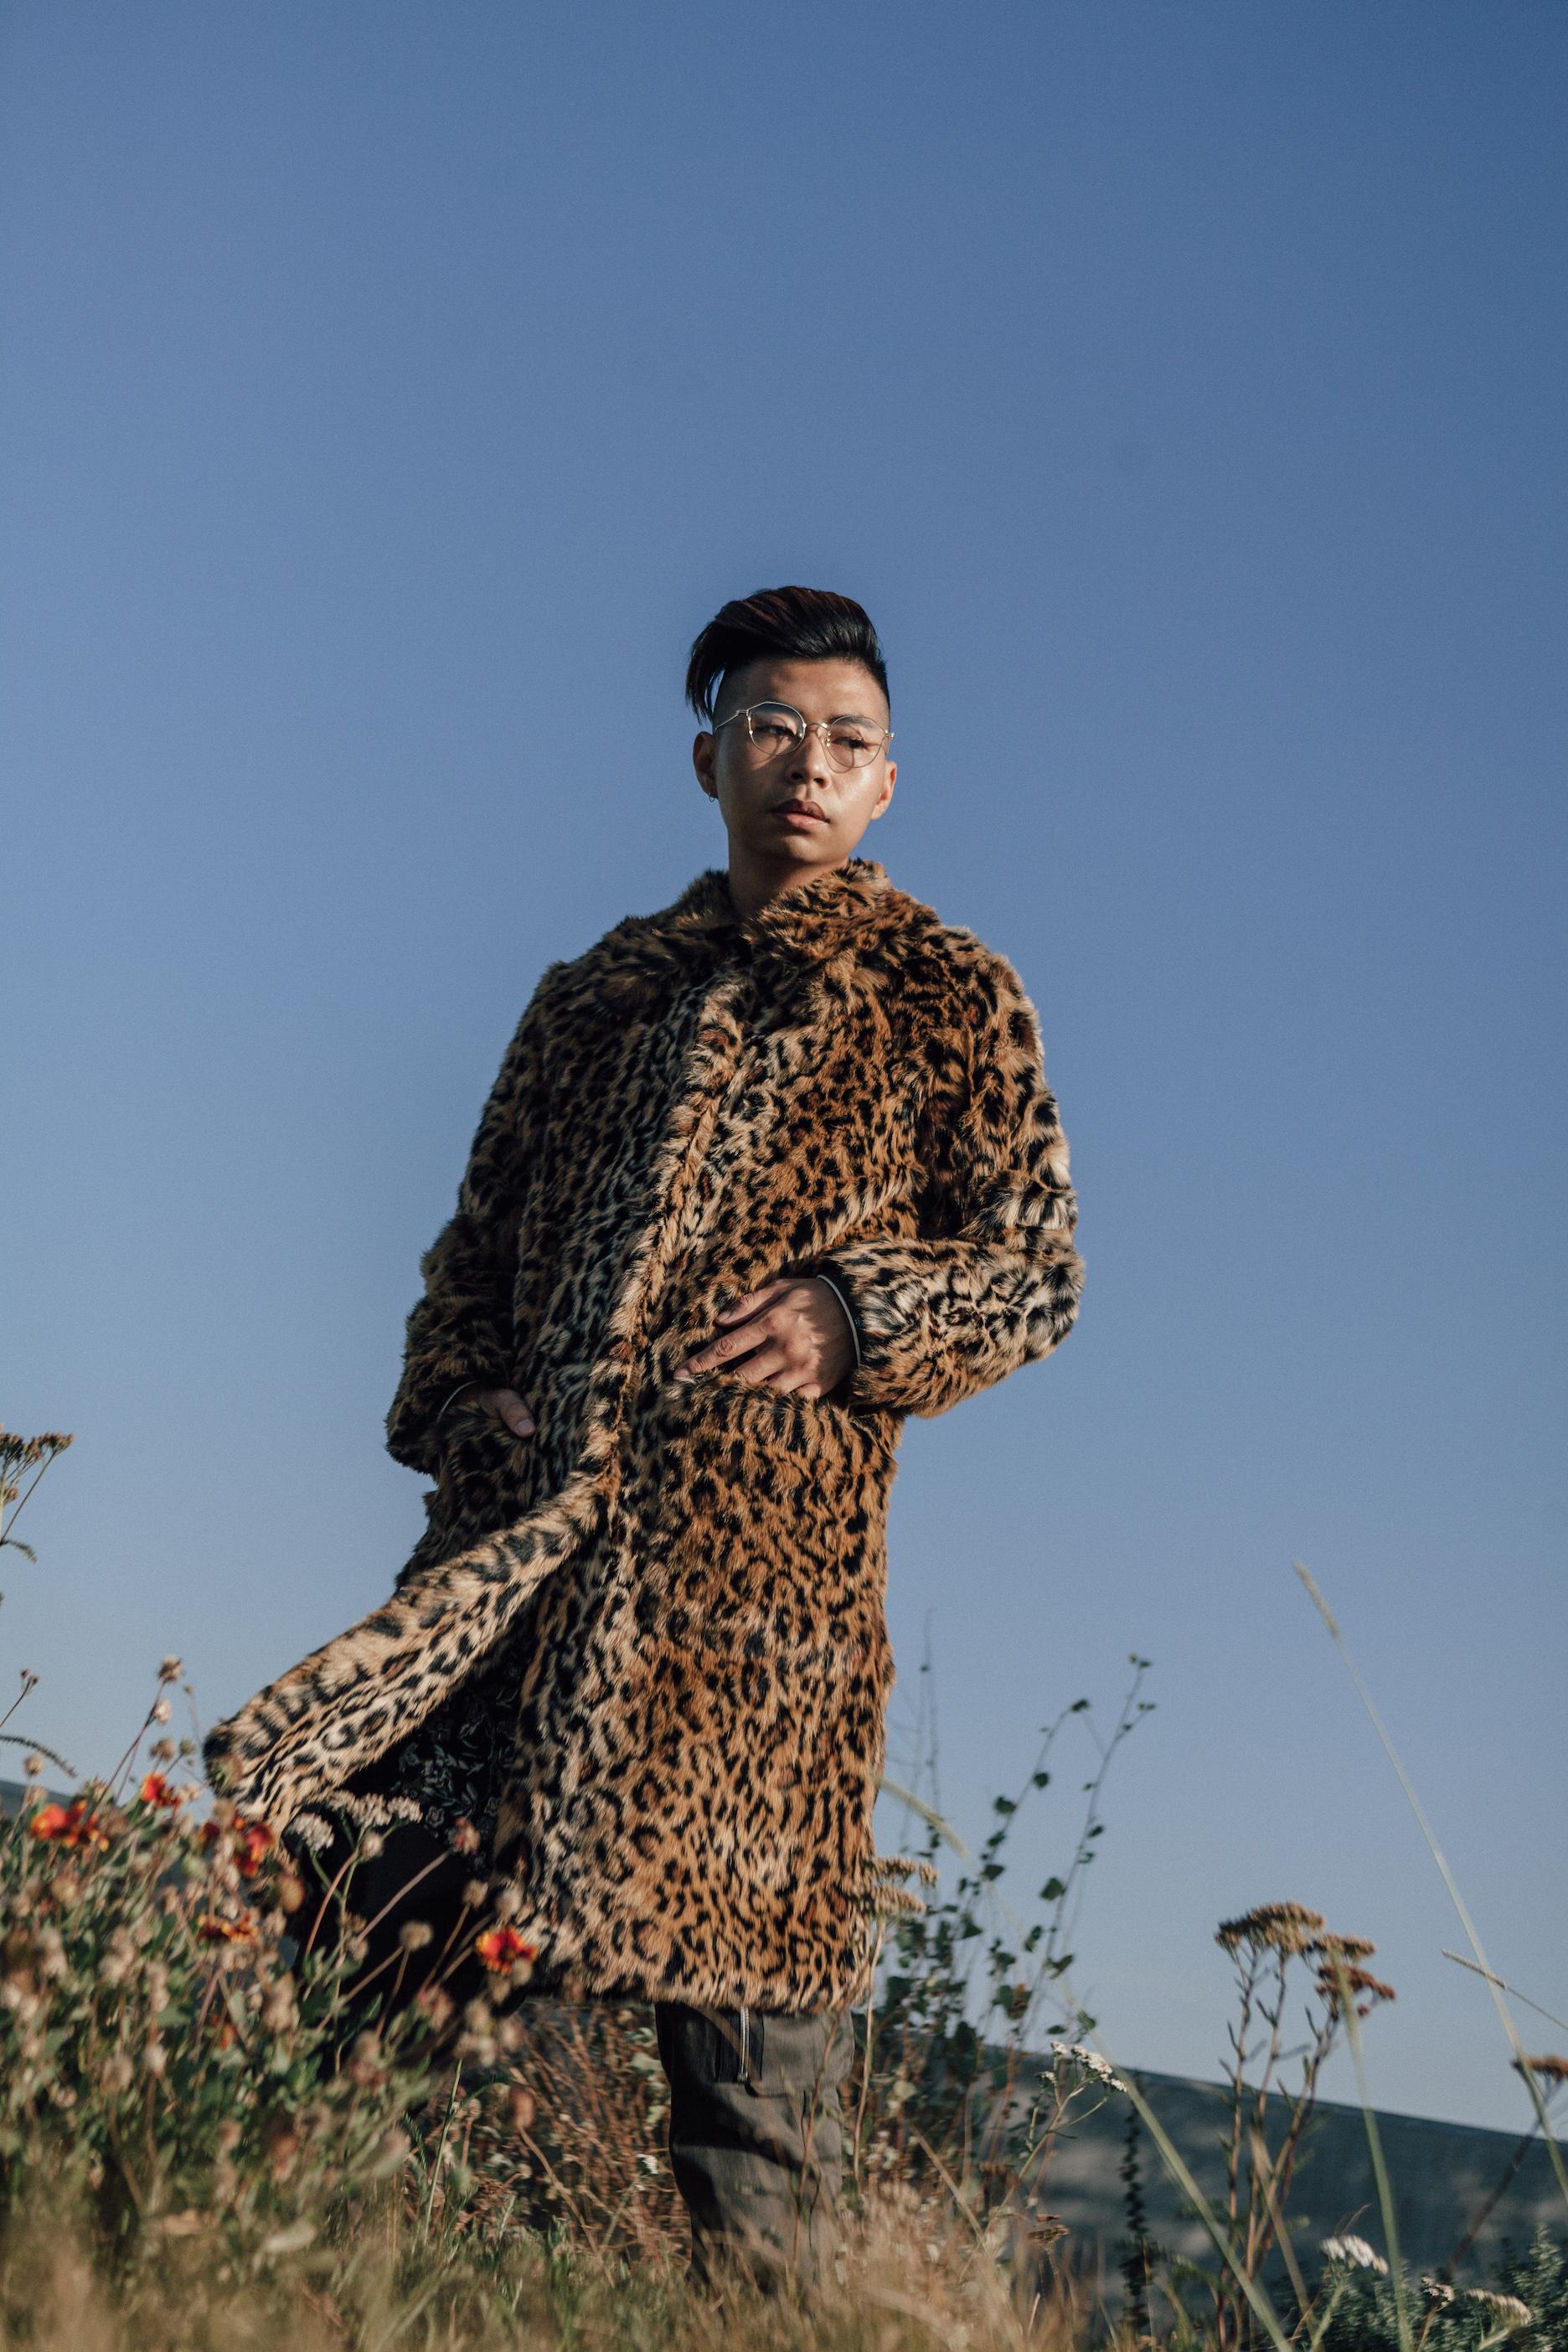 mybelonging-tommylei-top-menswear-blogger-erdem-x-hm-streetstyle-azusa-takano-photography54.jpg